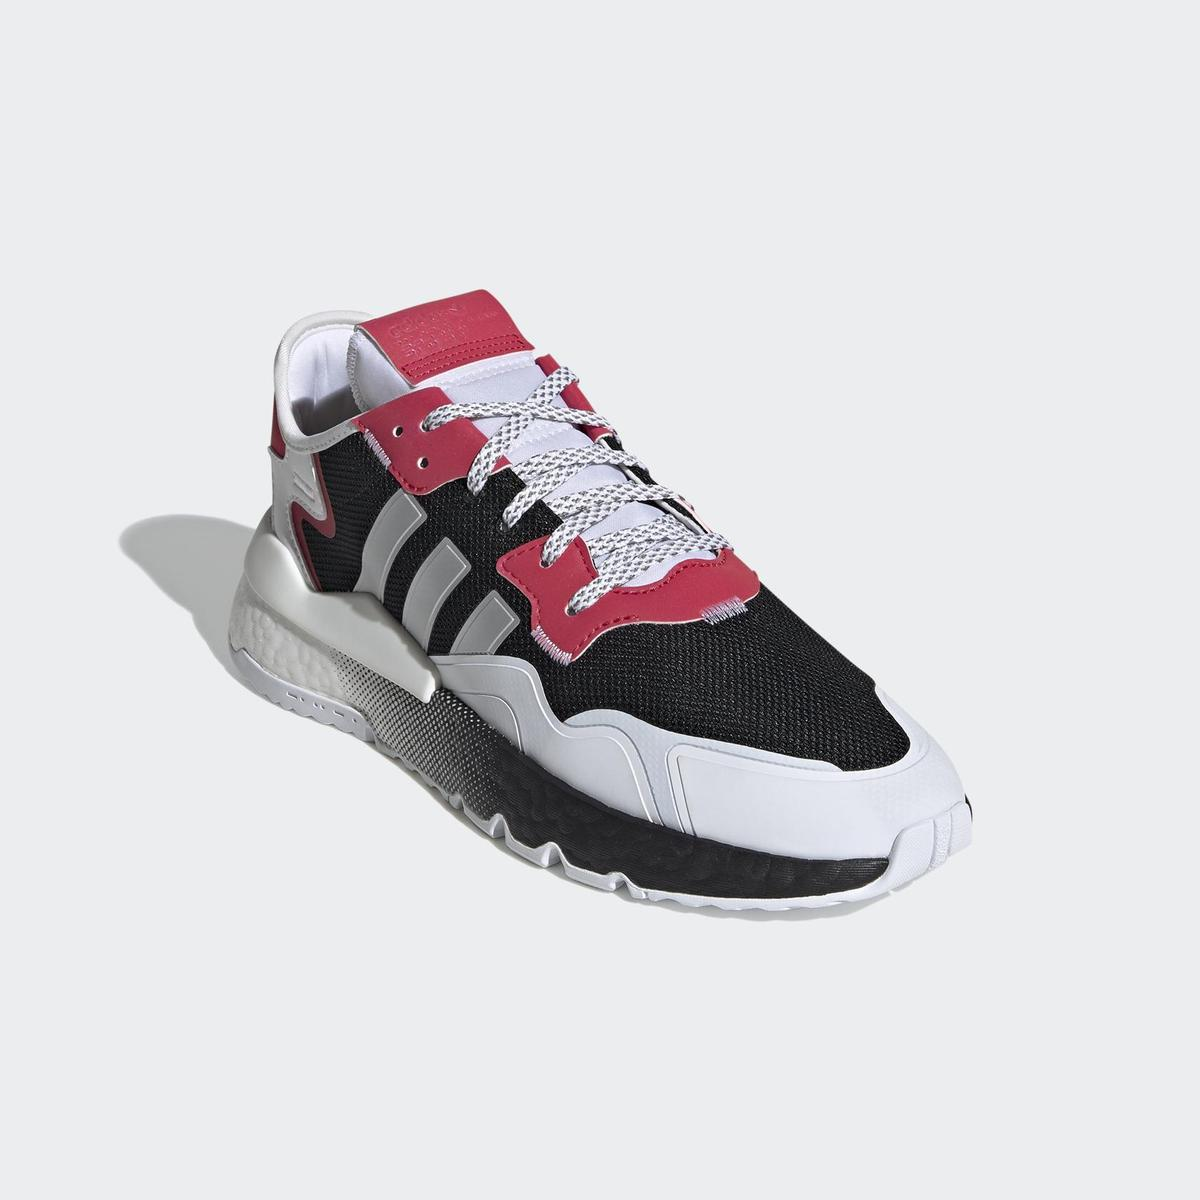 adidas Originals Nite Jogger男生鞋款。NT$5,290(adidas Originals提供)